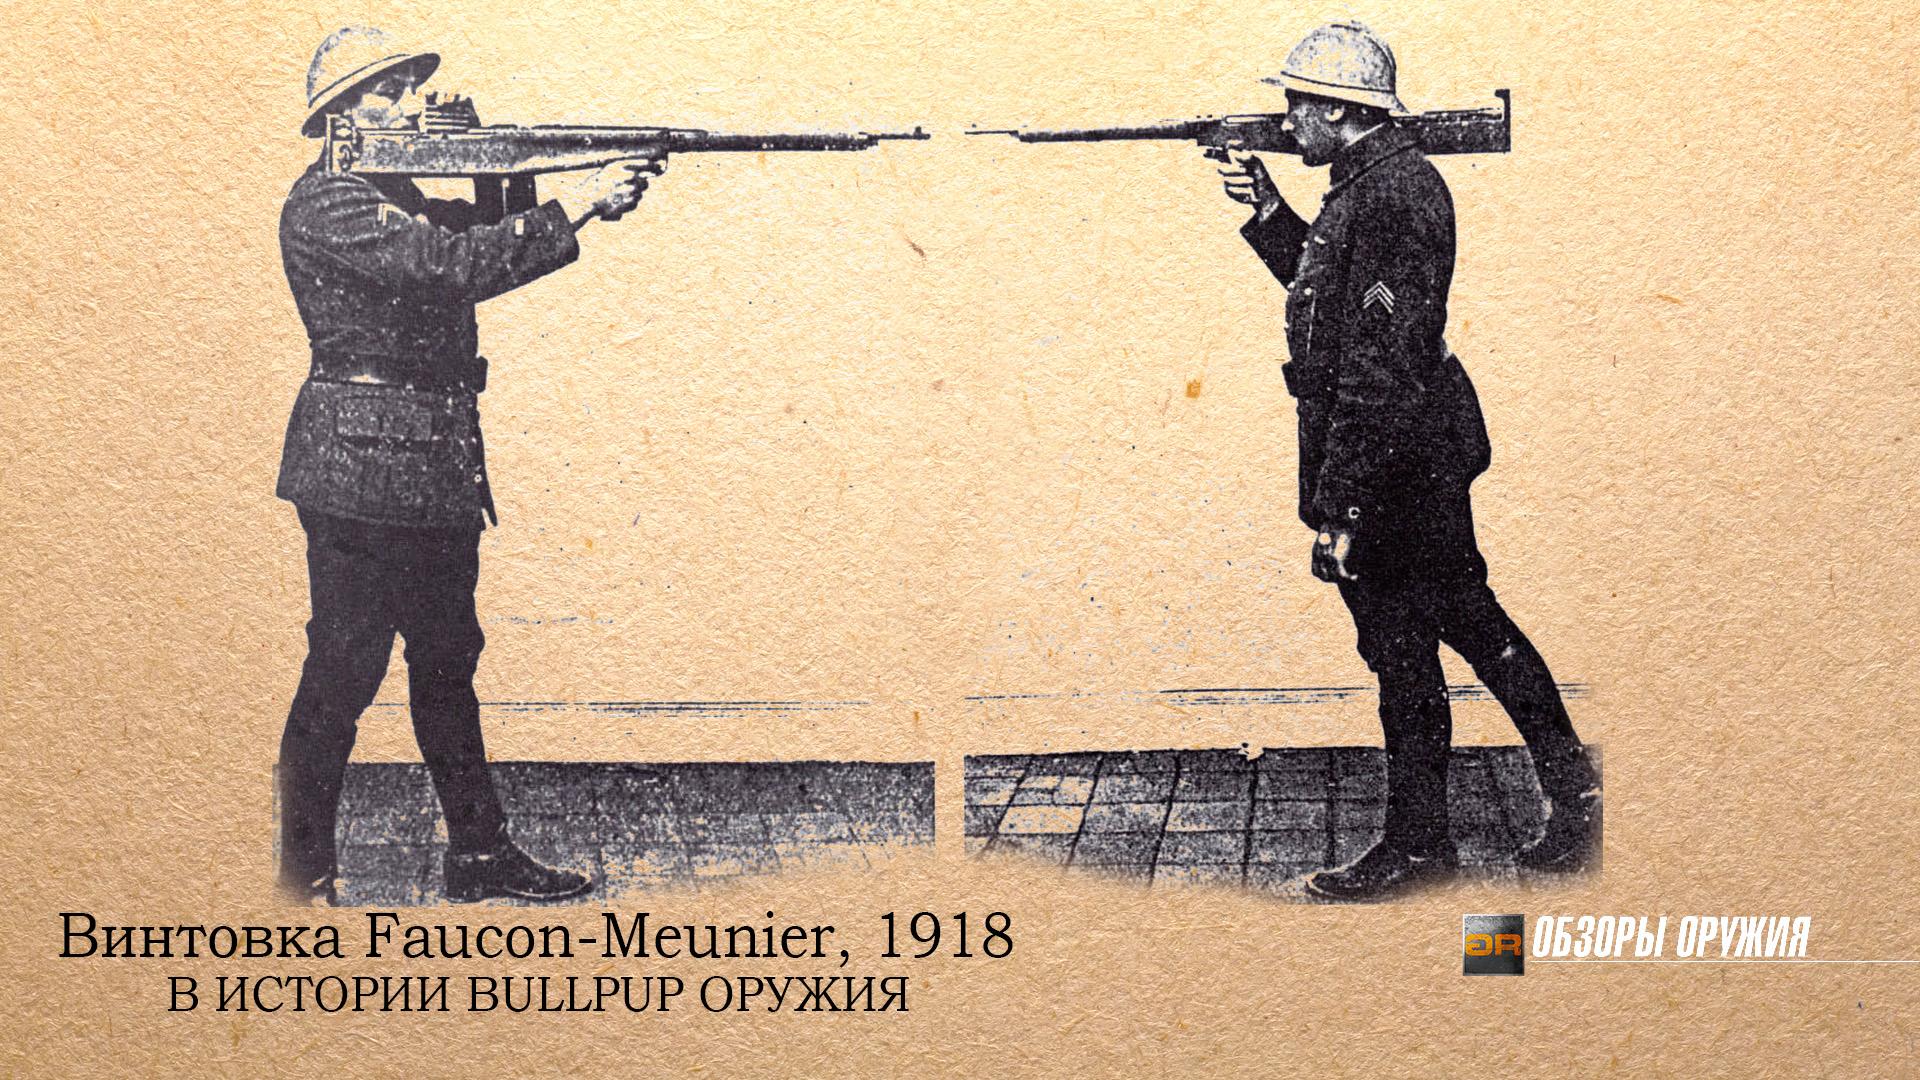 Винтовка Faucon Meunier, 1918г